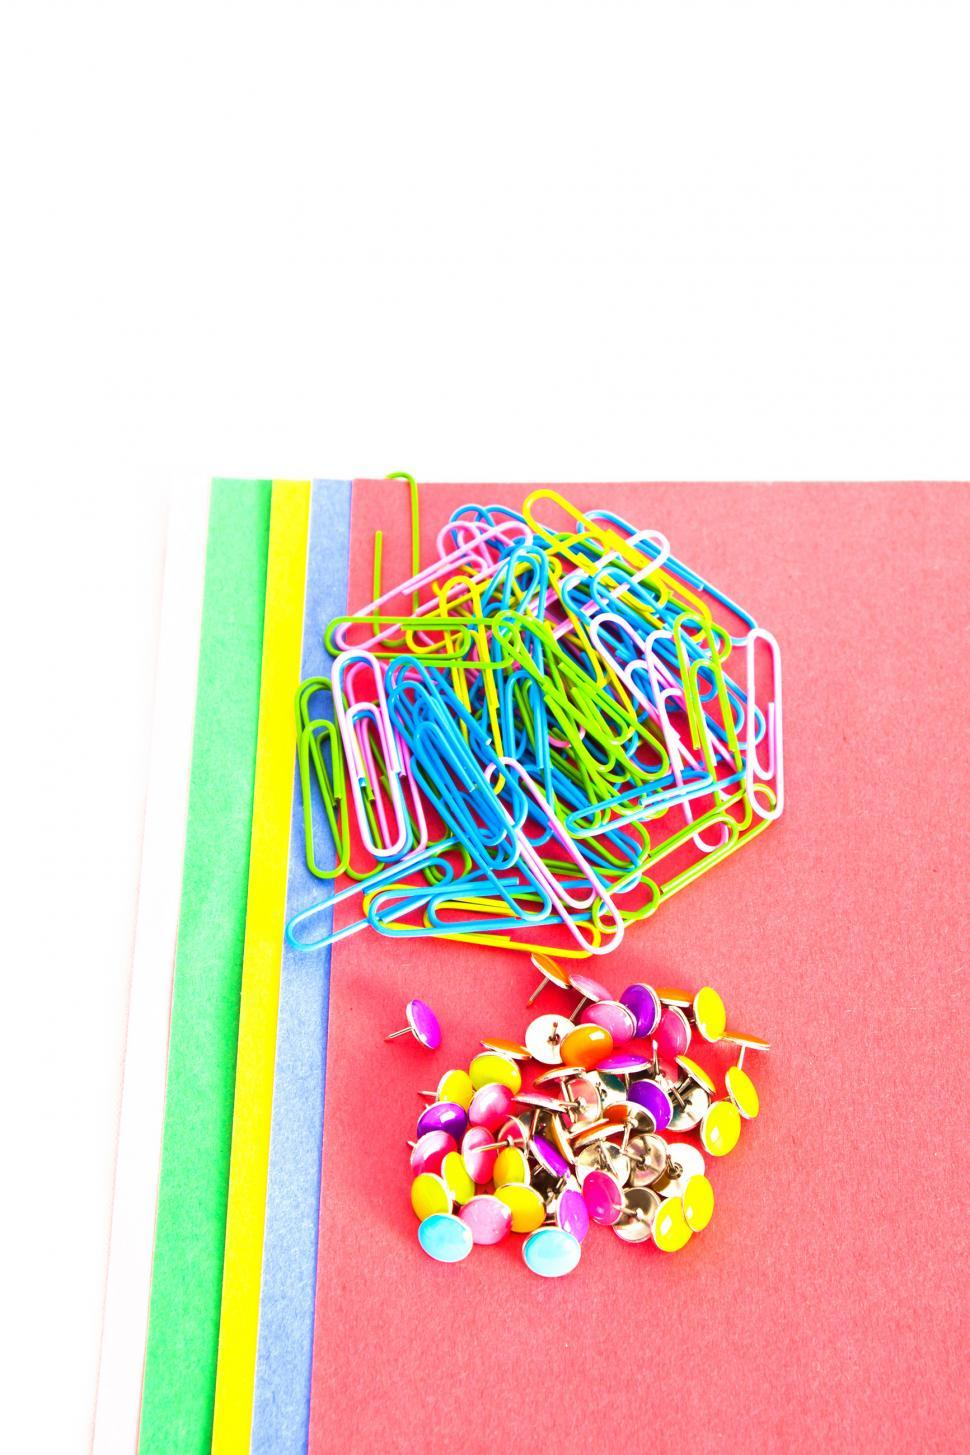 Download Free Stock HD Photo of School Supplies Online